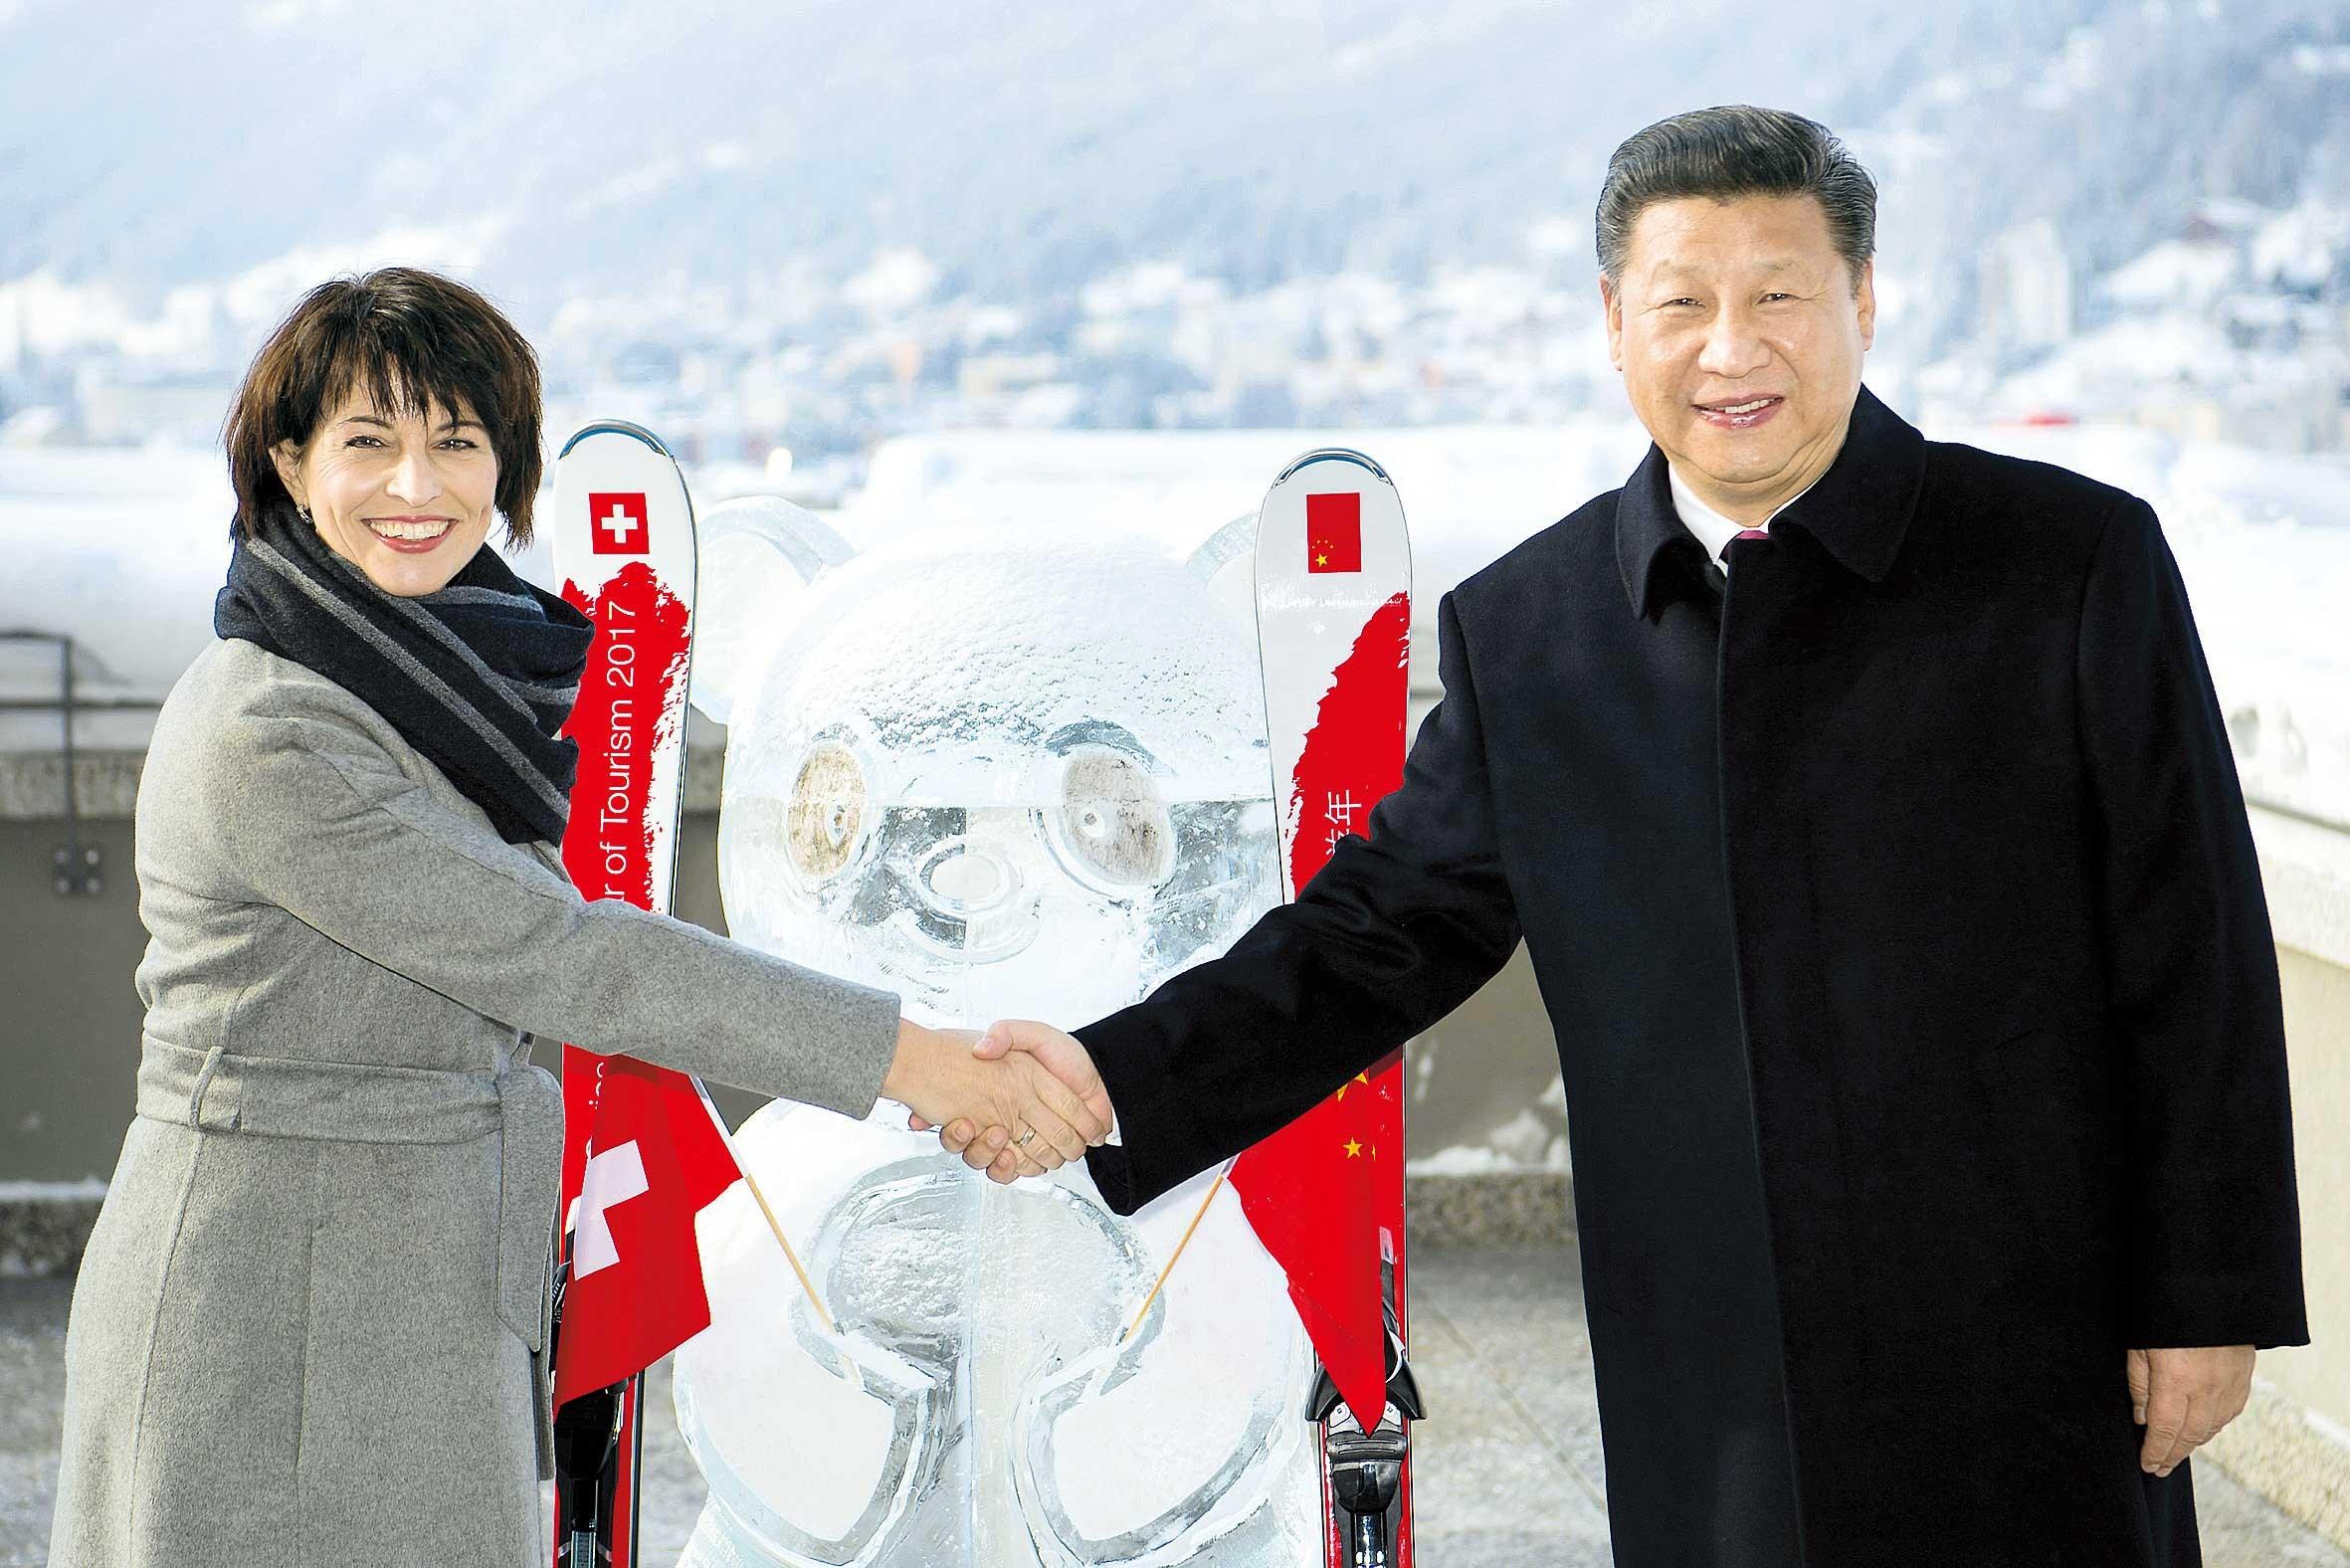 Xi warns world against trade war